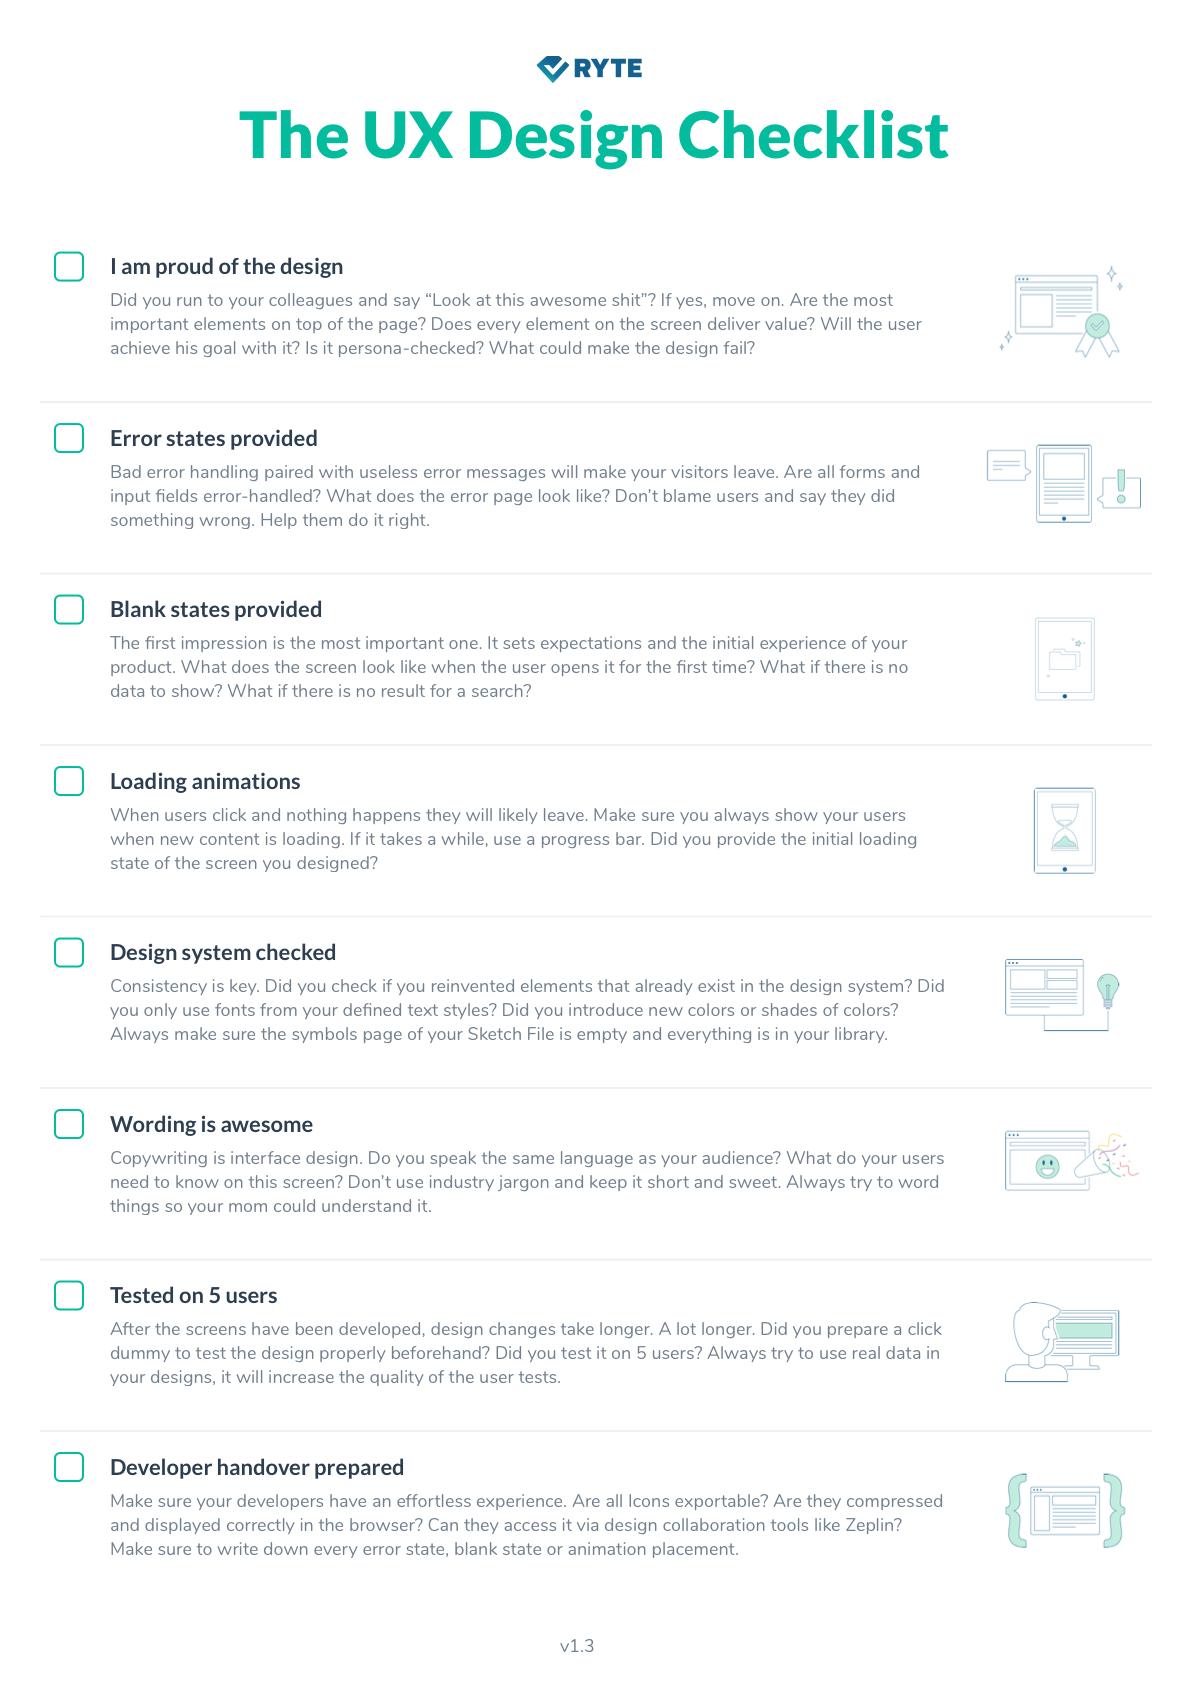 The Ux Design Checklist Softwaredesign The Ux Design Checklist Ryte Medium Ux Design Principles Ux Design Ux Design Portfolio